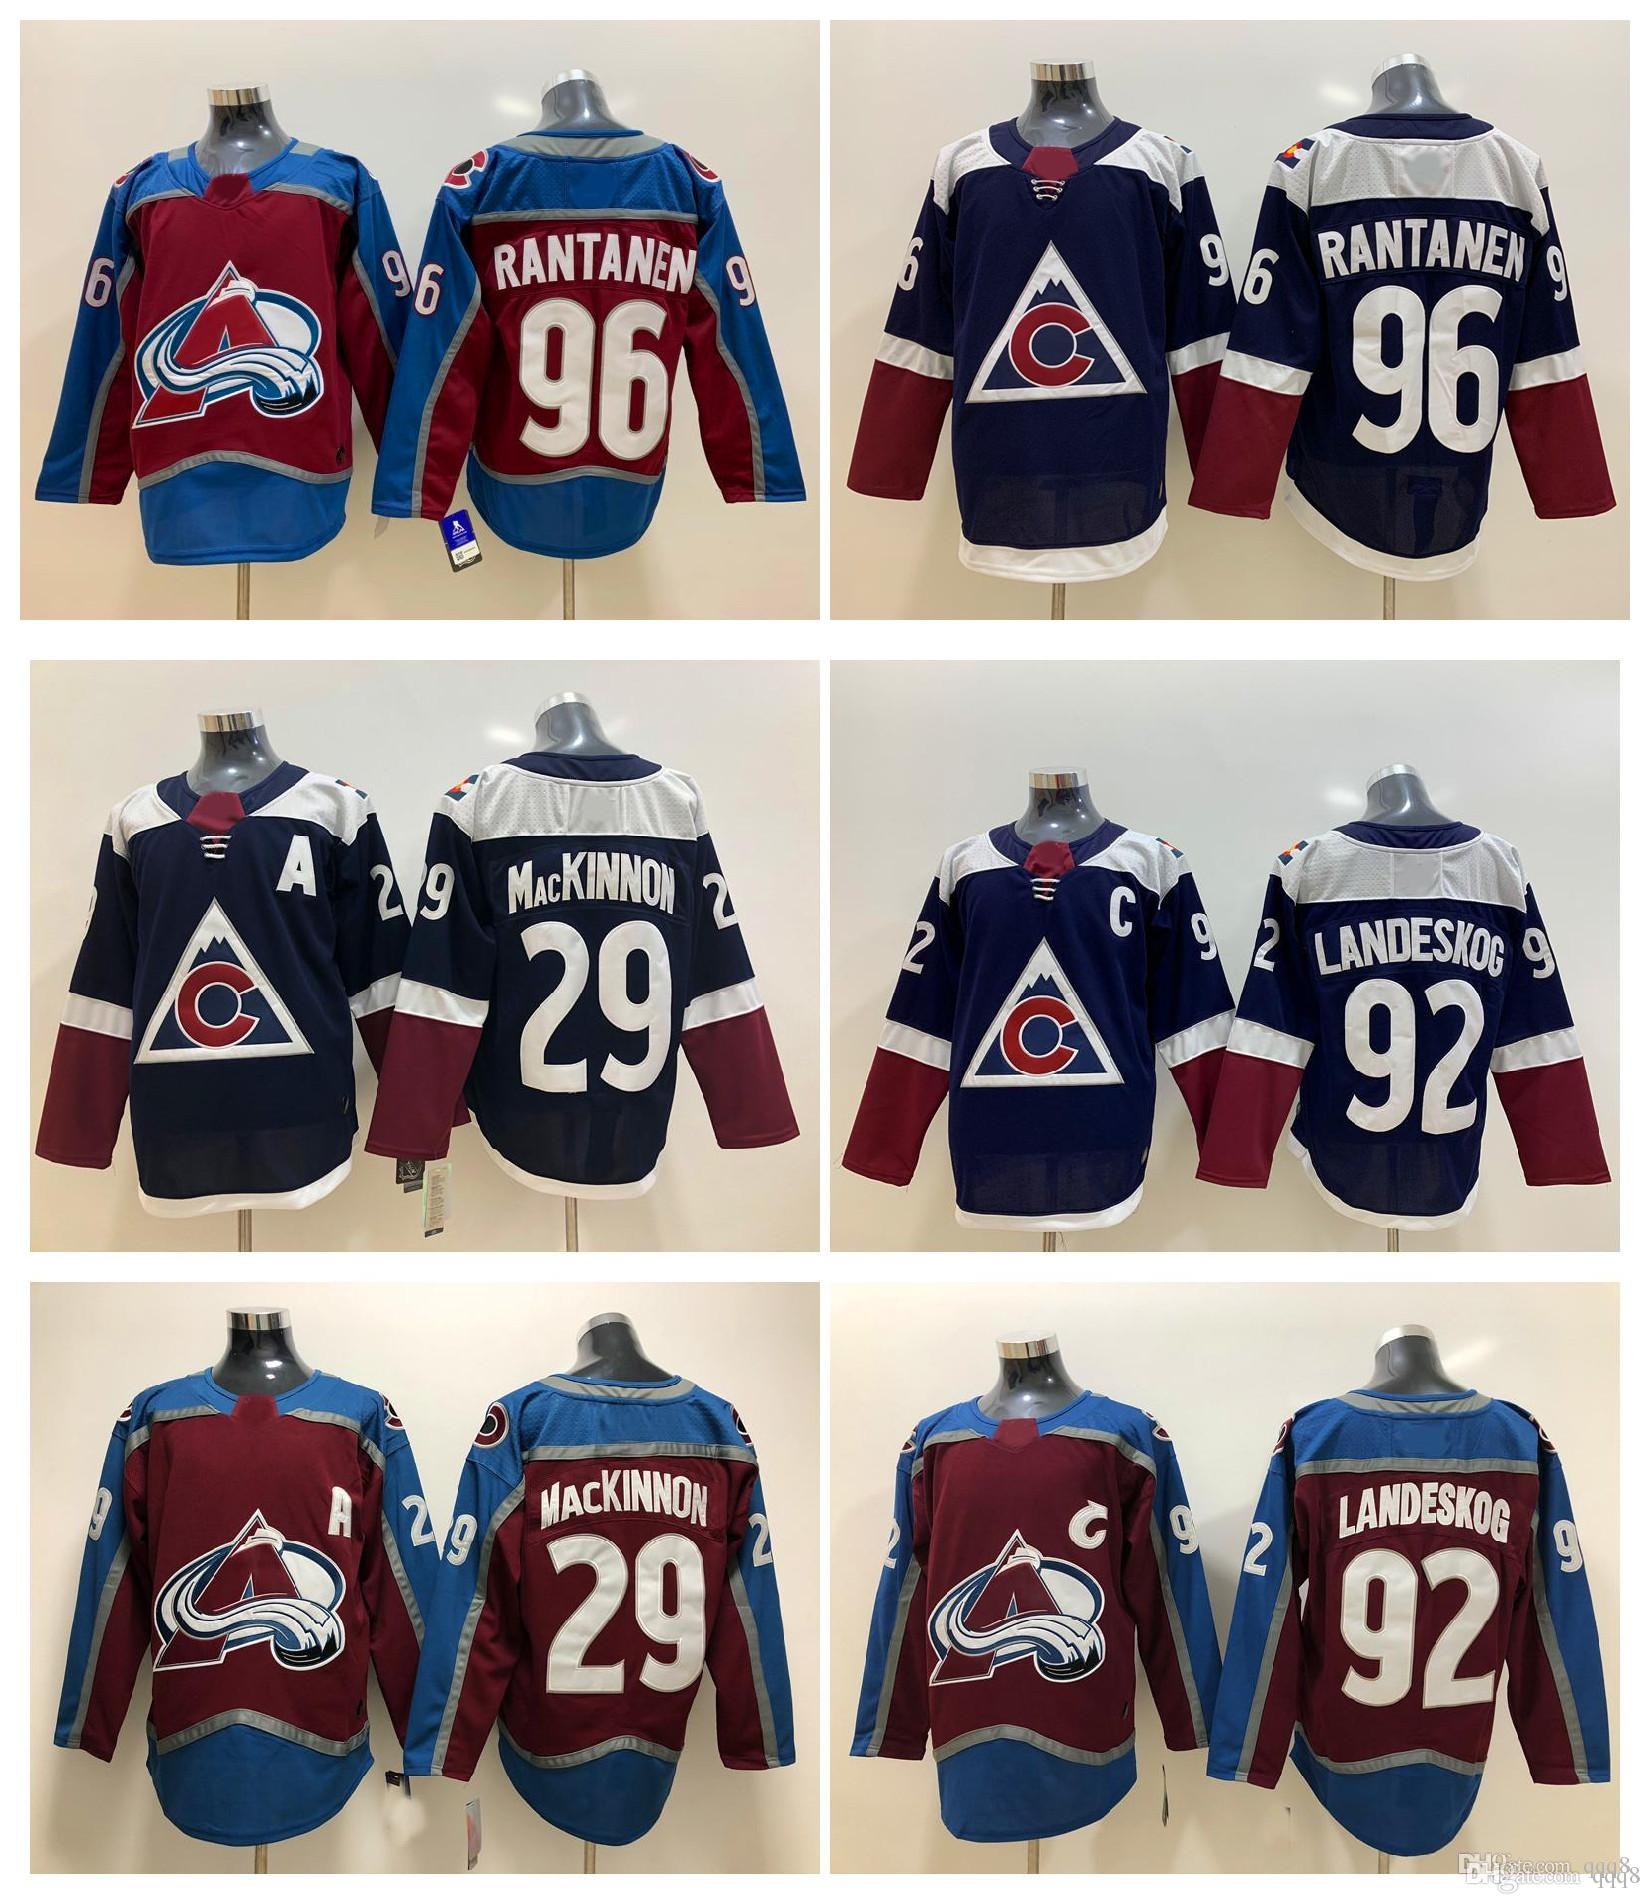 08657849 2019 NHL Colorado Avalanche Jersey 29 Nathan MacKinnon 92 Gabriel Landeskog  96 Mikko Rantanen Red Blue Stitched Ice Hockey Jerseys From Qqq8, ...